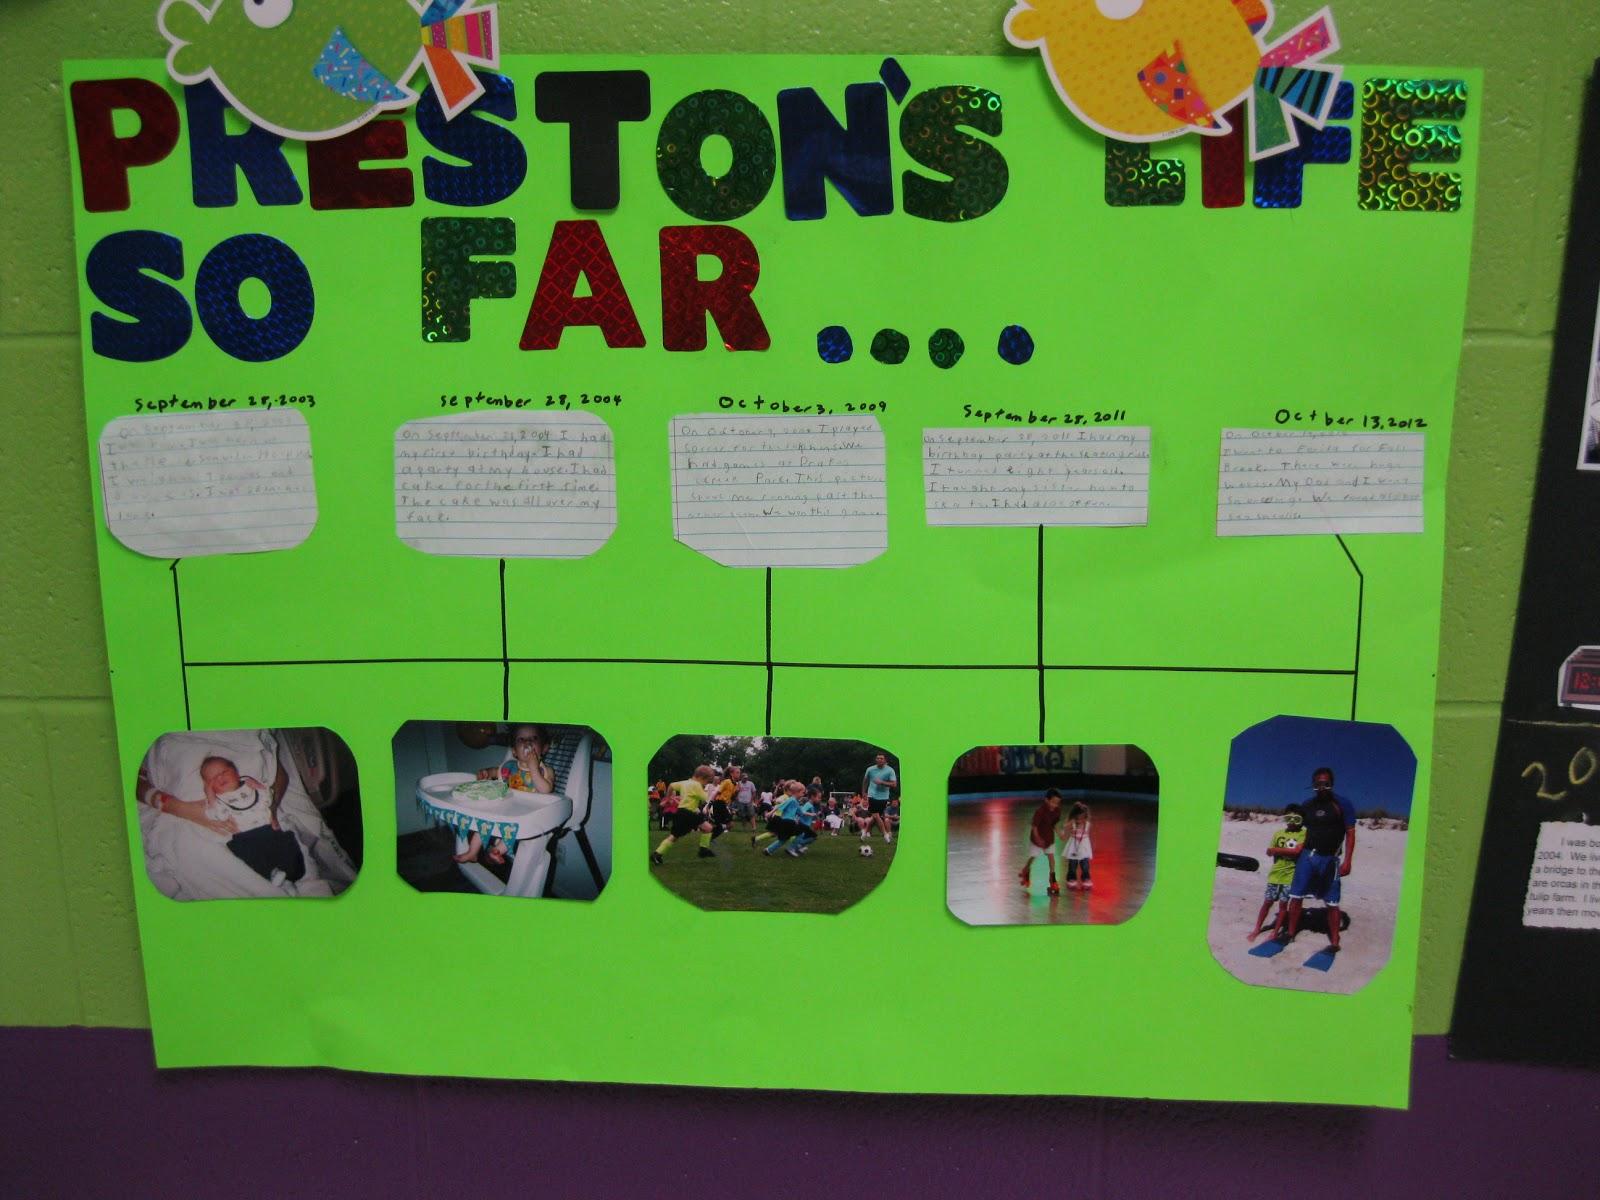 Timeline projects   Timeline project, Kids timeline, Life ...  Creative Timeline Project Ideas